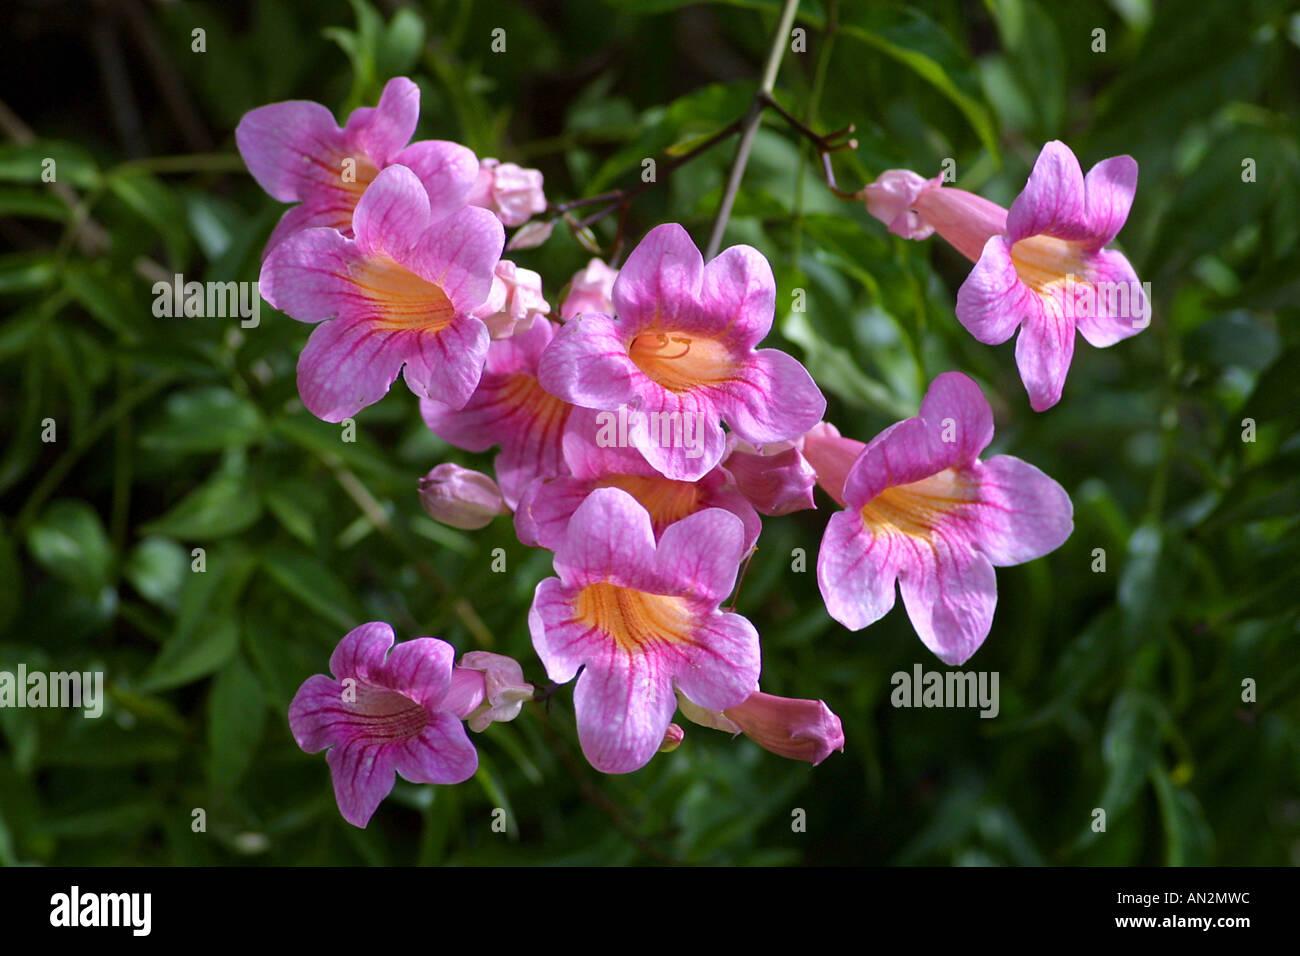 Pink trumpet vine stock photos pink trumpet vine stock images alamy podranea pink trumpet vine bignone rose podranea ricasoliana flowers stock mightylinksfo